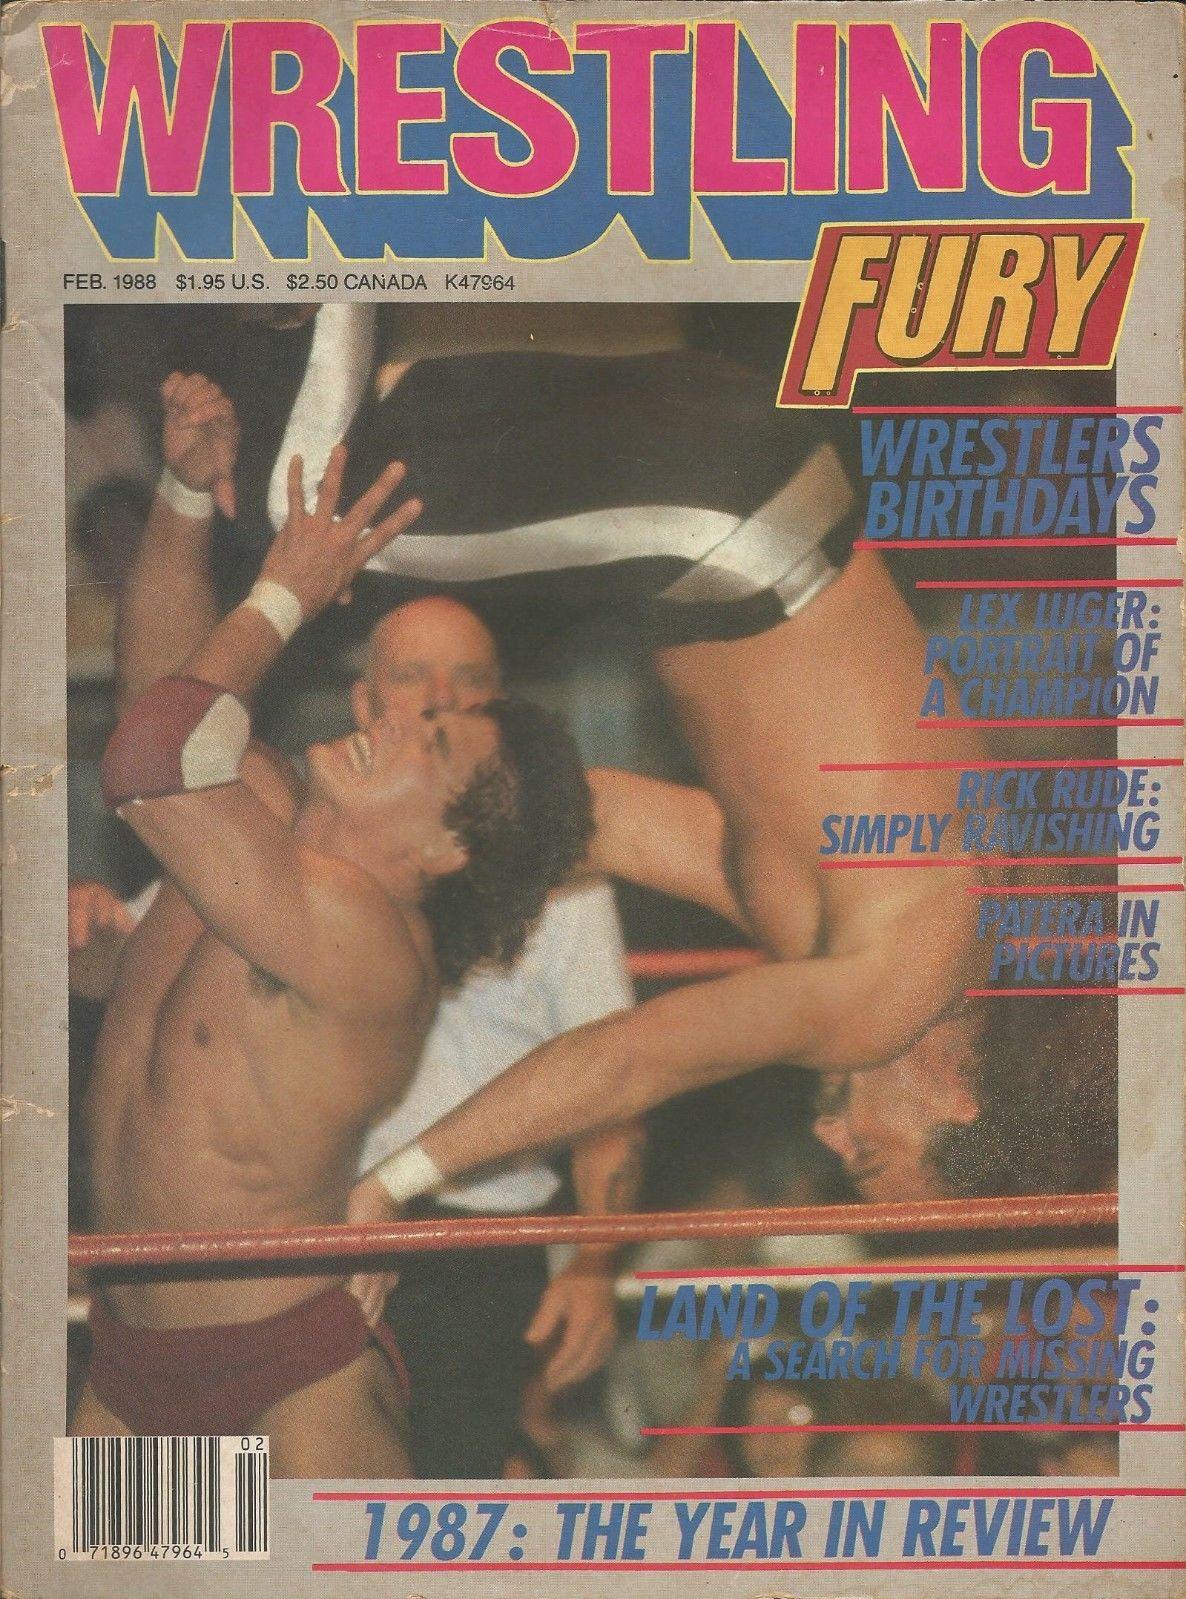 Wrestling Fury - February 1988